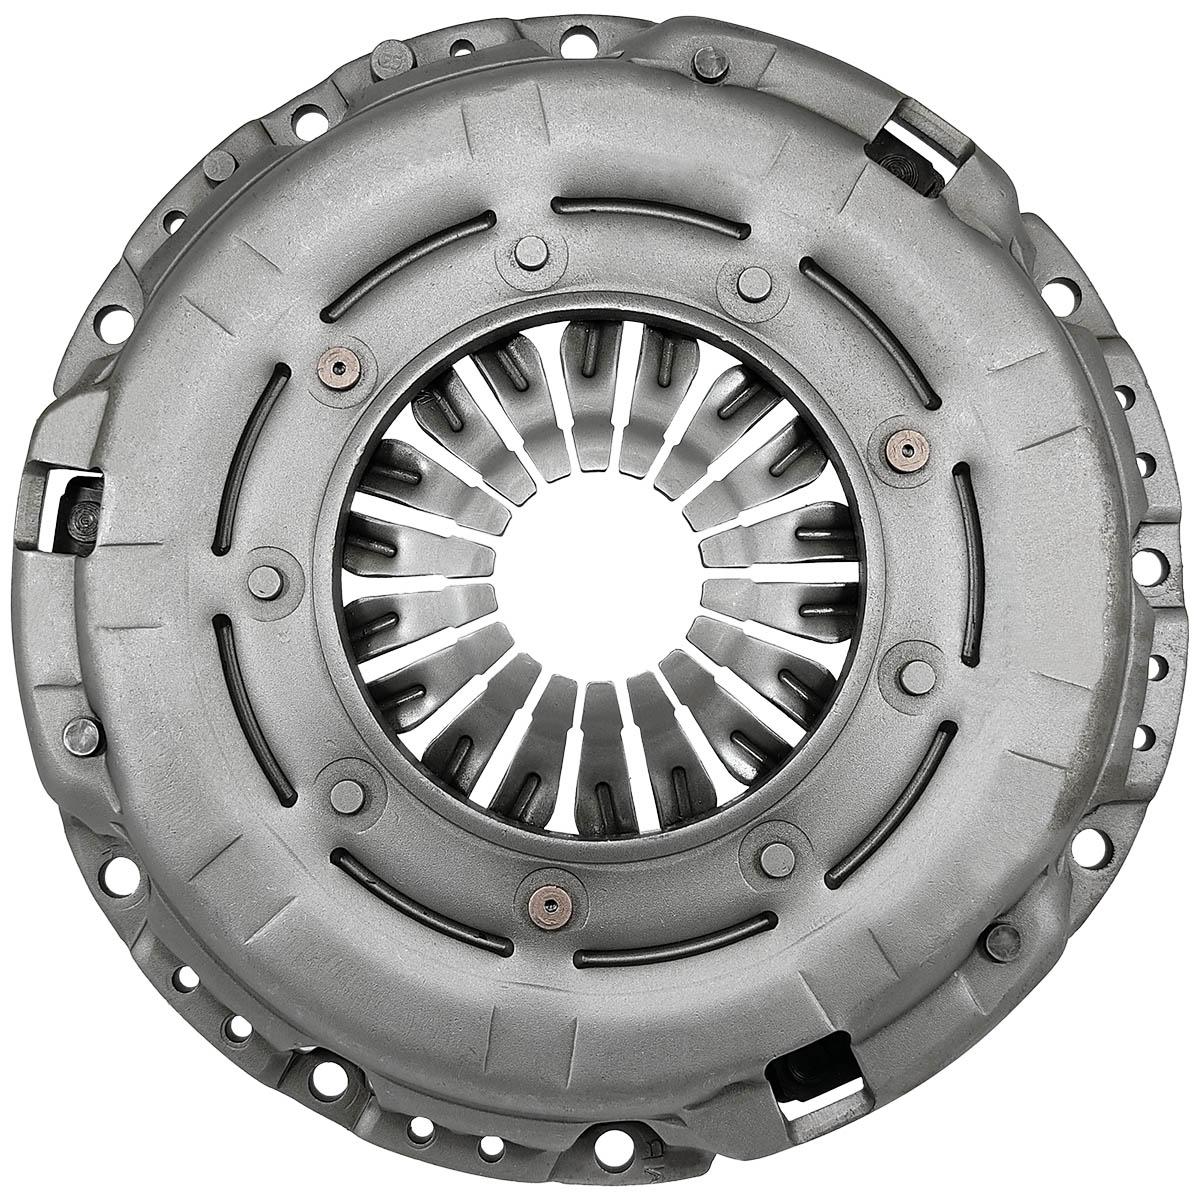 Kit Embreagem ix35 2.0 16v Flex 2010 a 2014, Tucson 2.0 16v Flex 2013 2014, Sportage 2.0 16v Flex 2011 a 2014